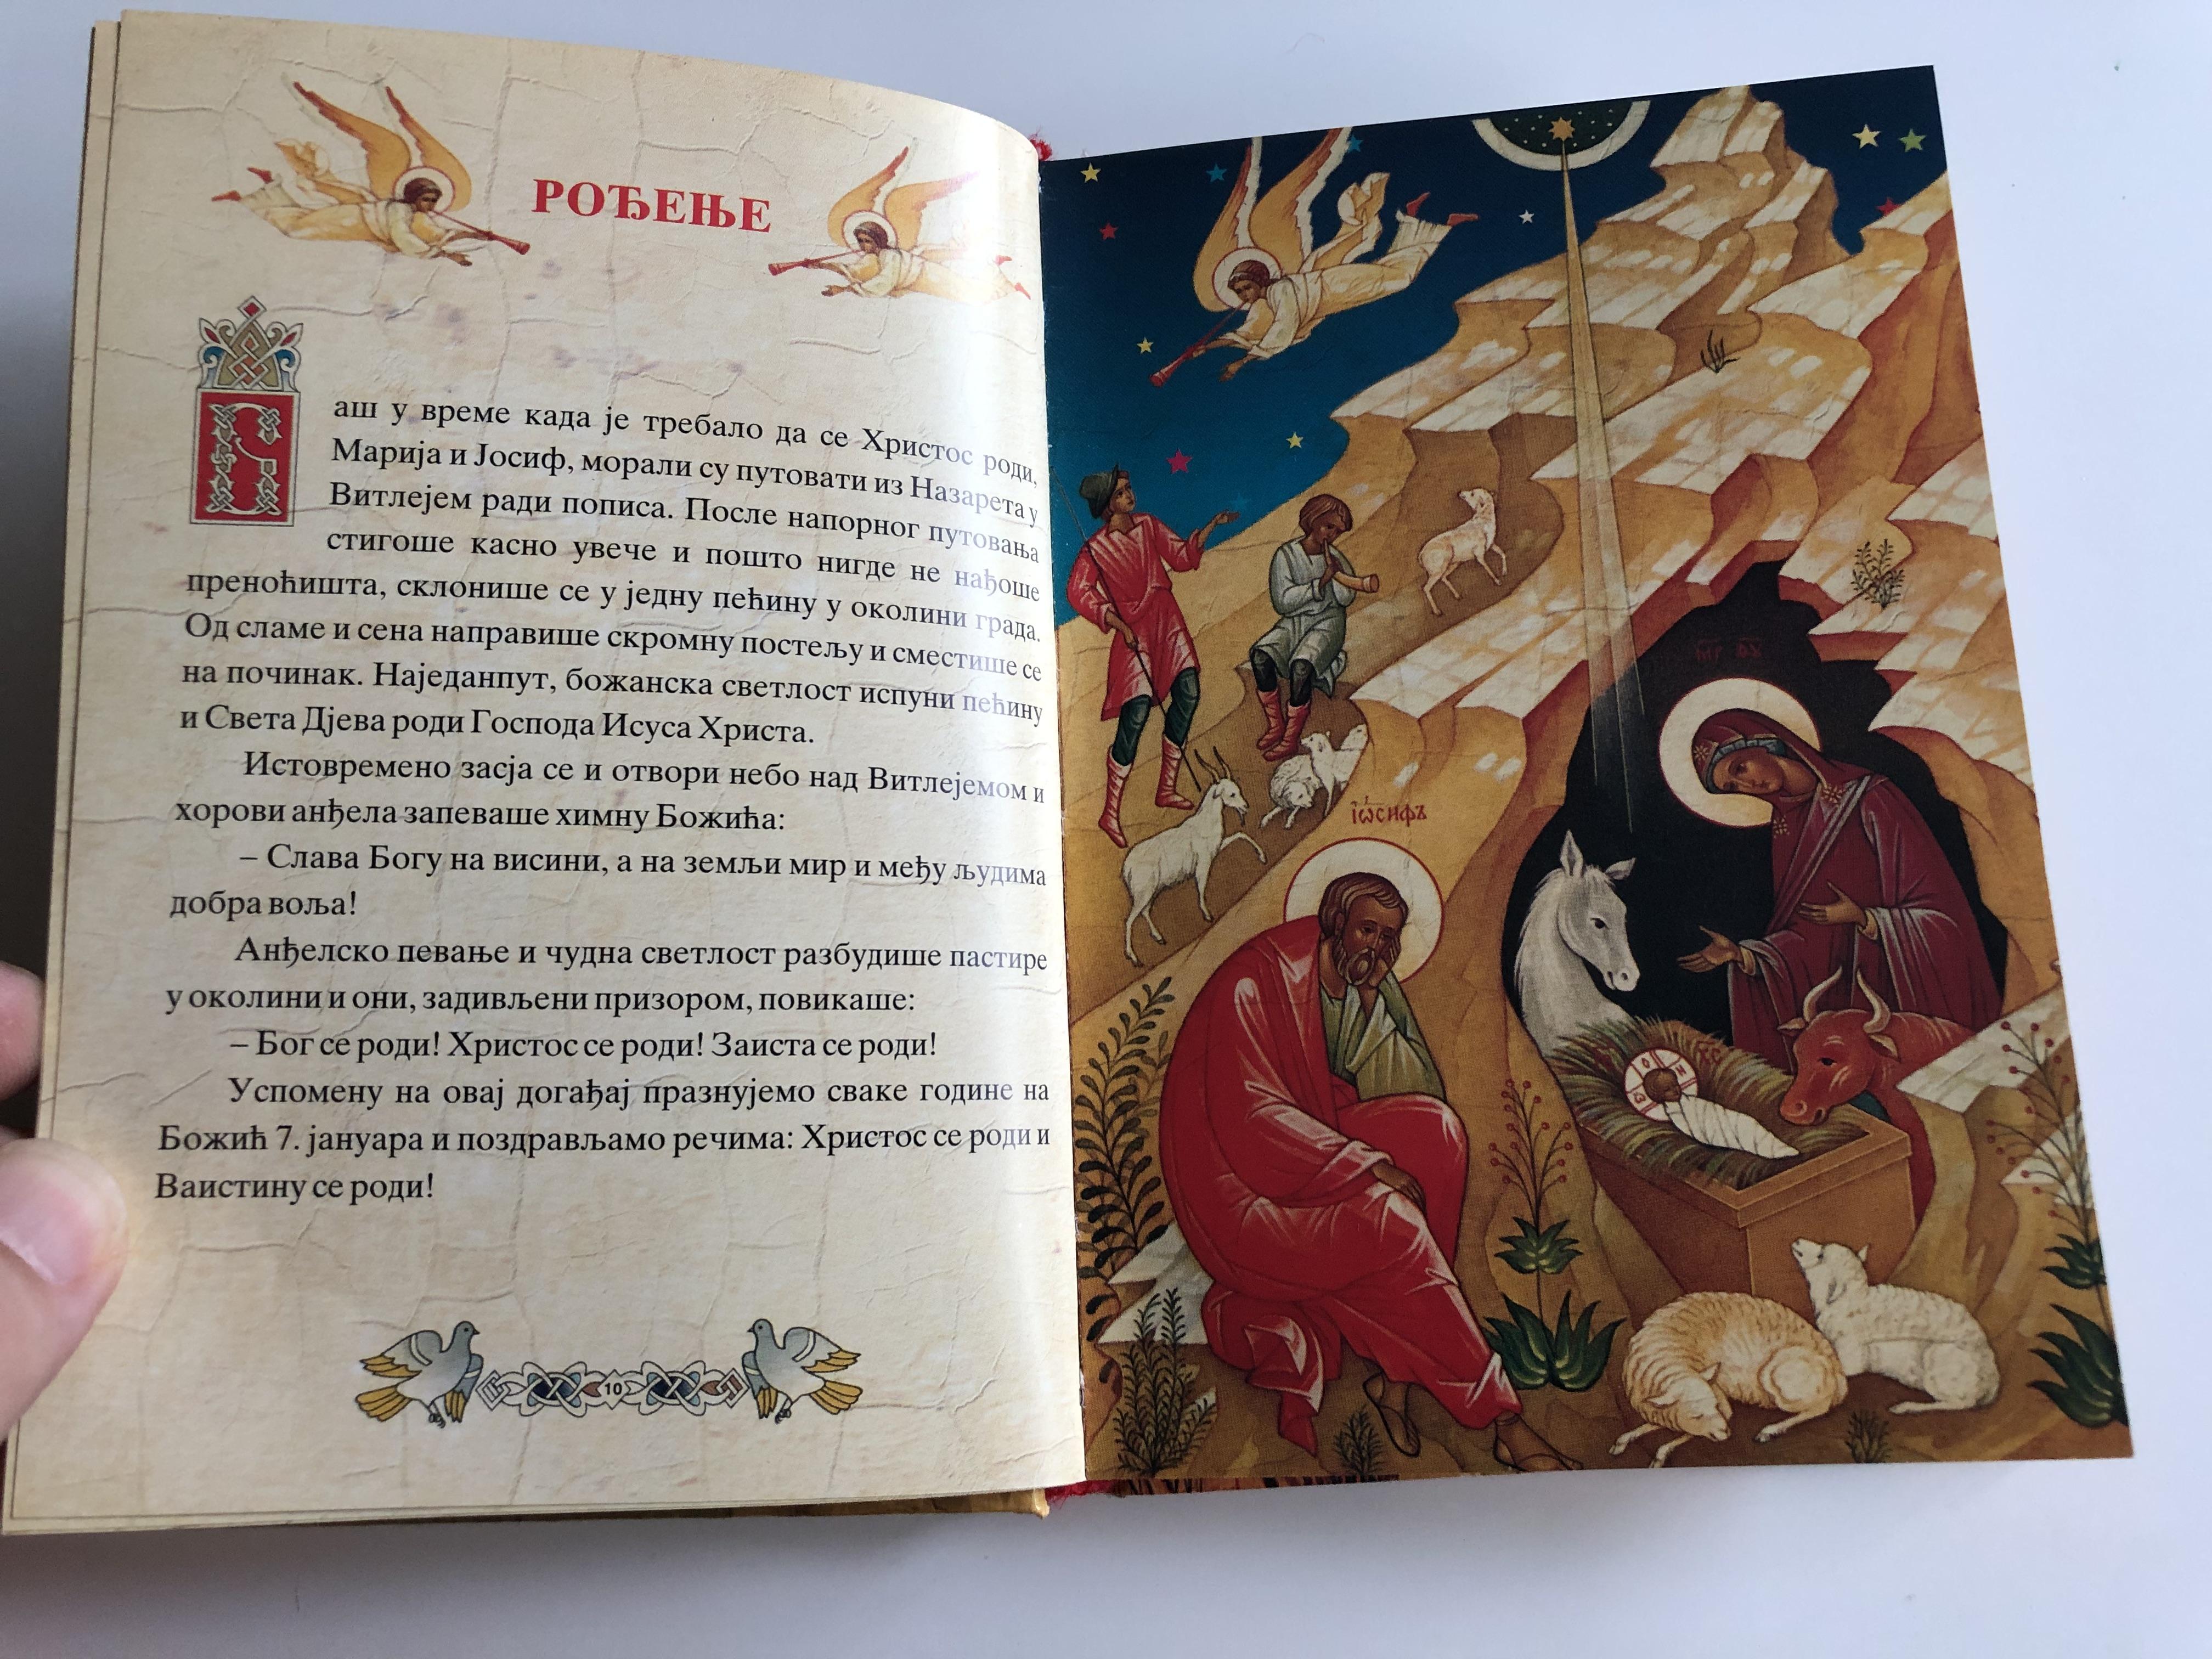 -serbian-orthodox-children-s-gospel-by-ljubomir-rankovic-hardcover-small-size-glas-crkve-2004-5-.jpg